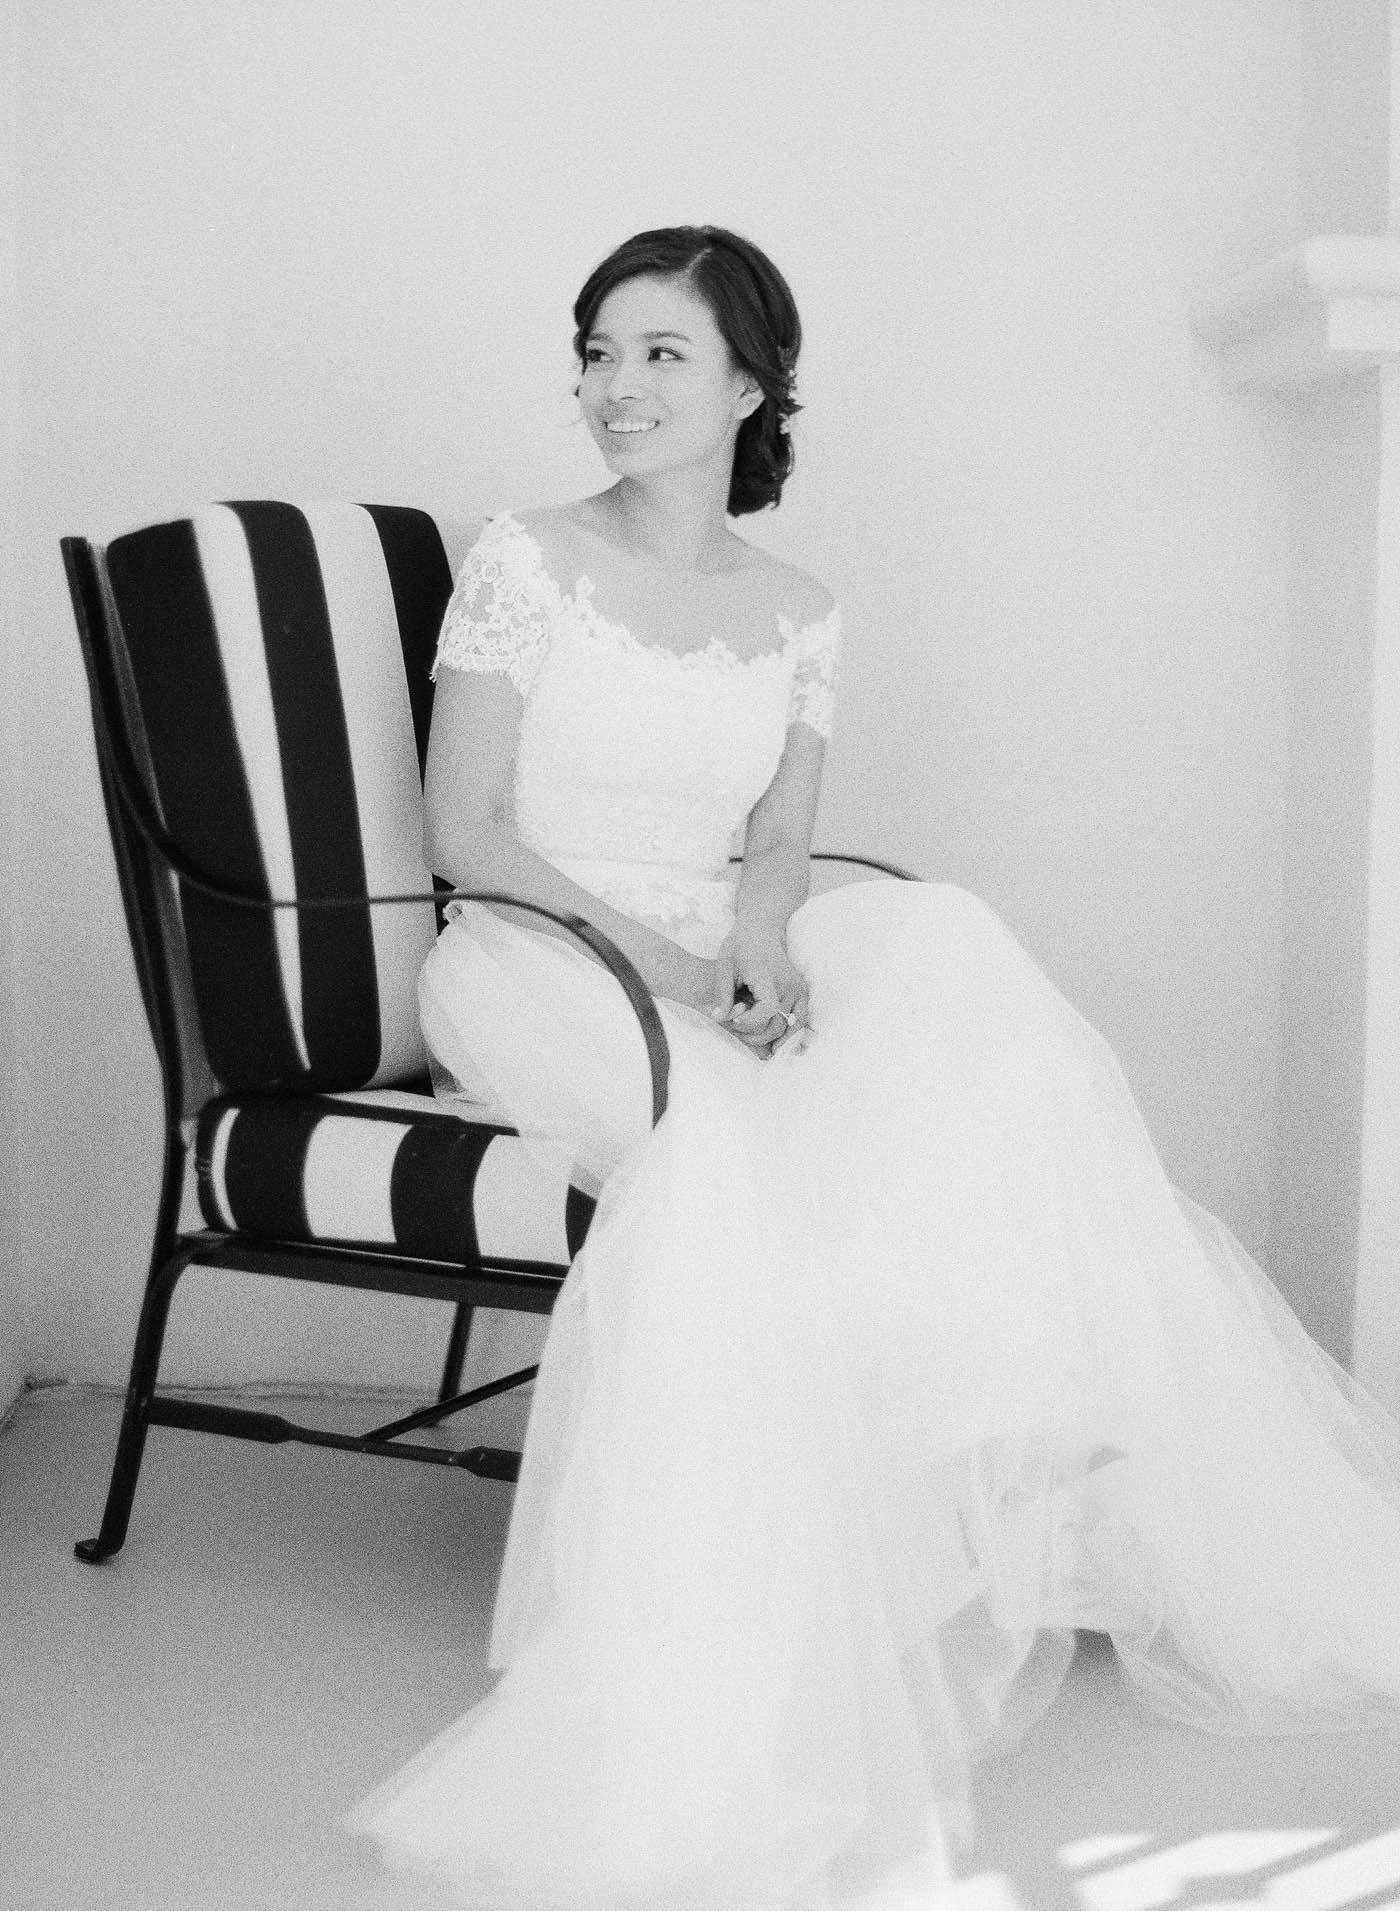 san-juan-capistrano-wedding-jen-huang-6.jpg